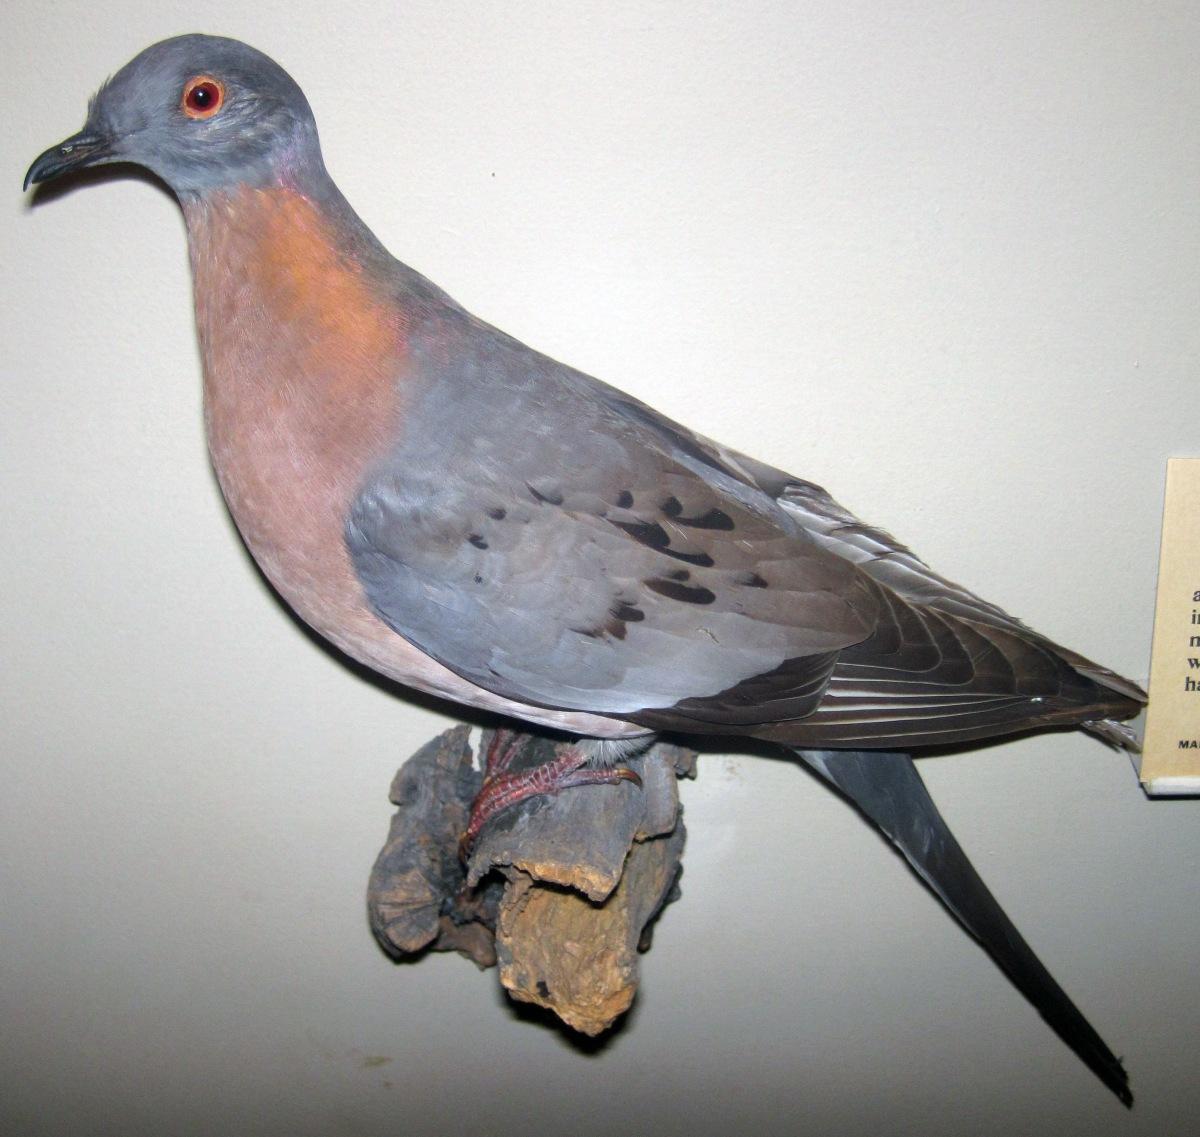 ectopistes_migratorius_28passenger_pigeon29